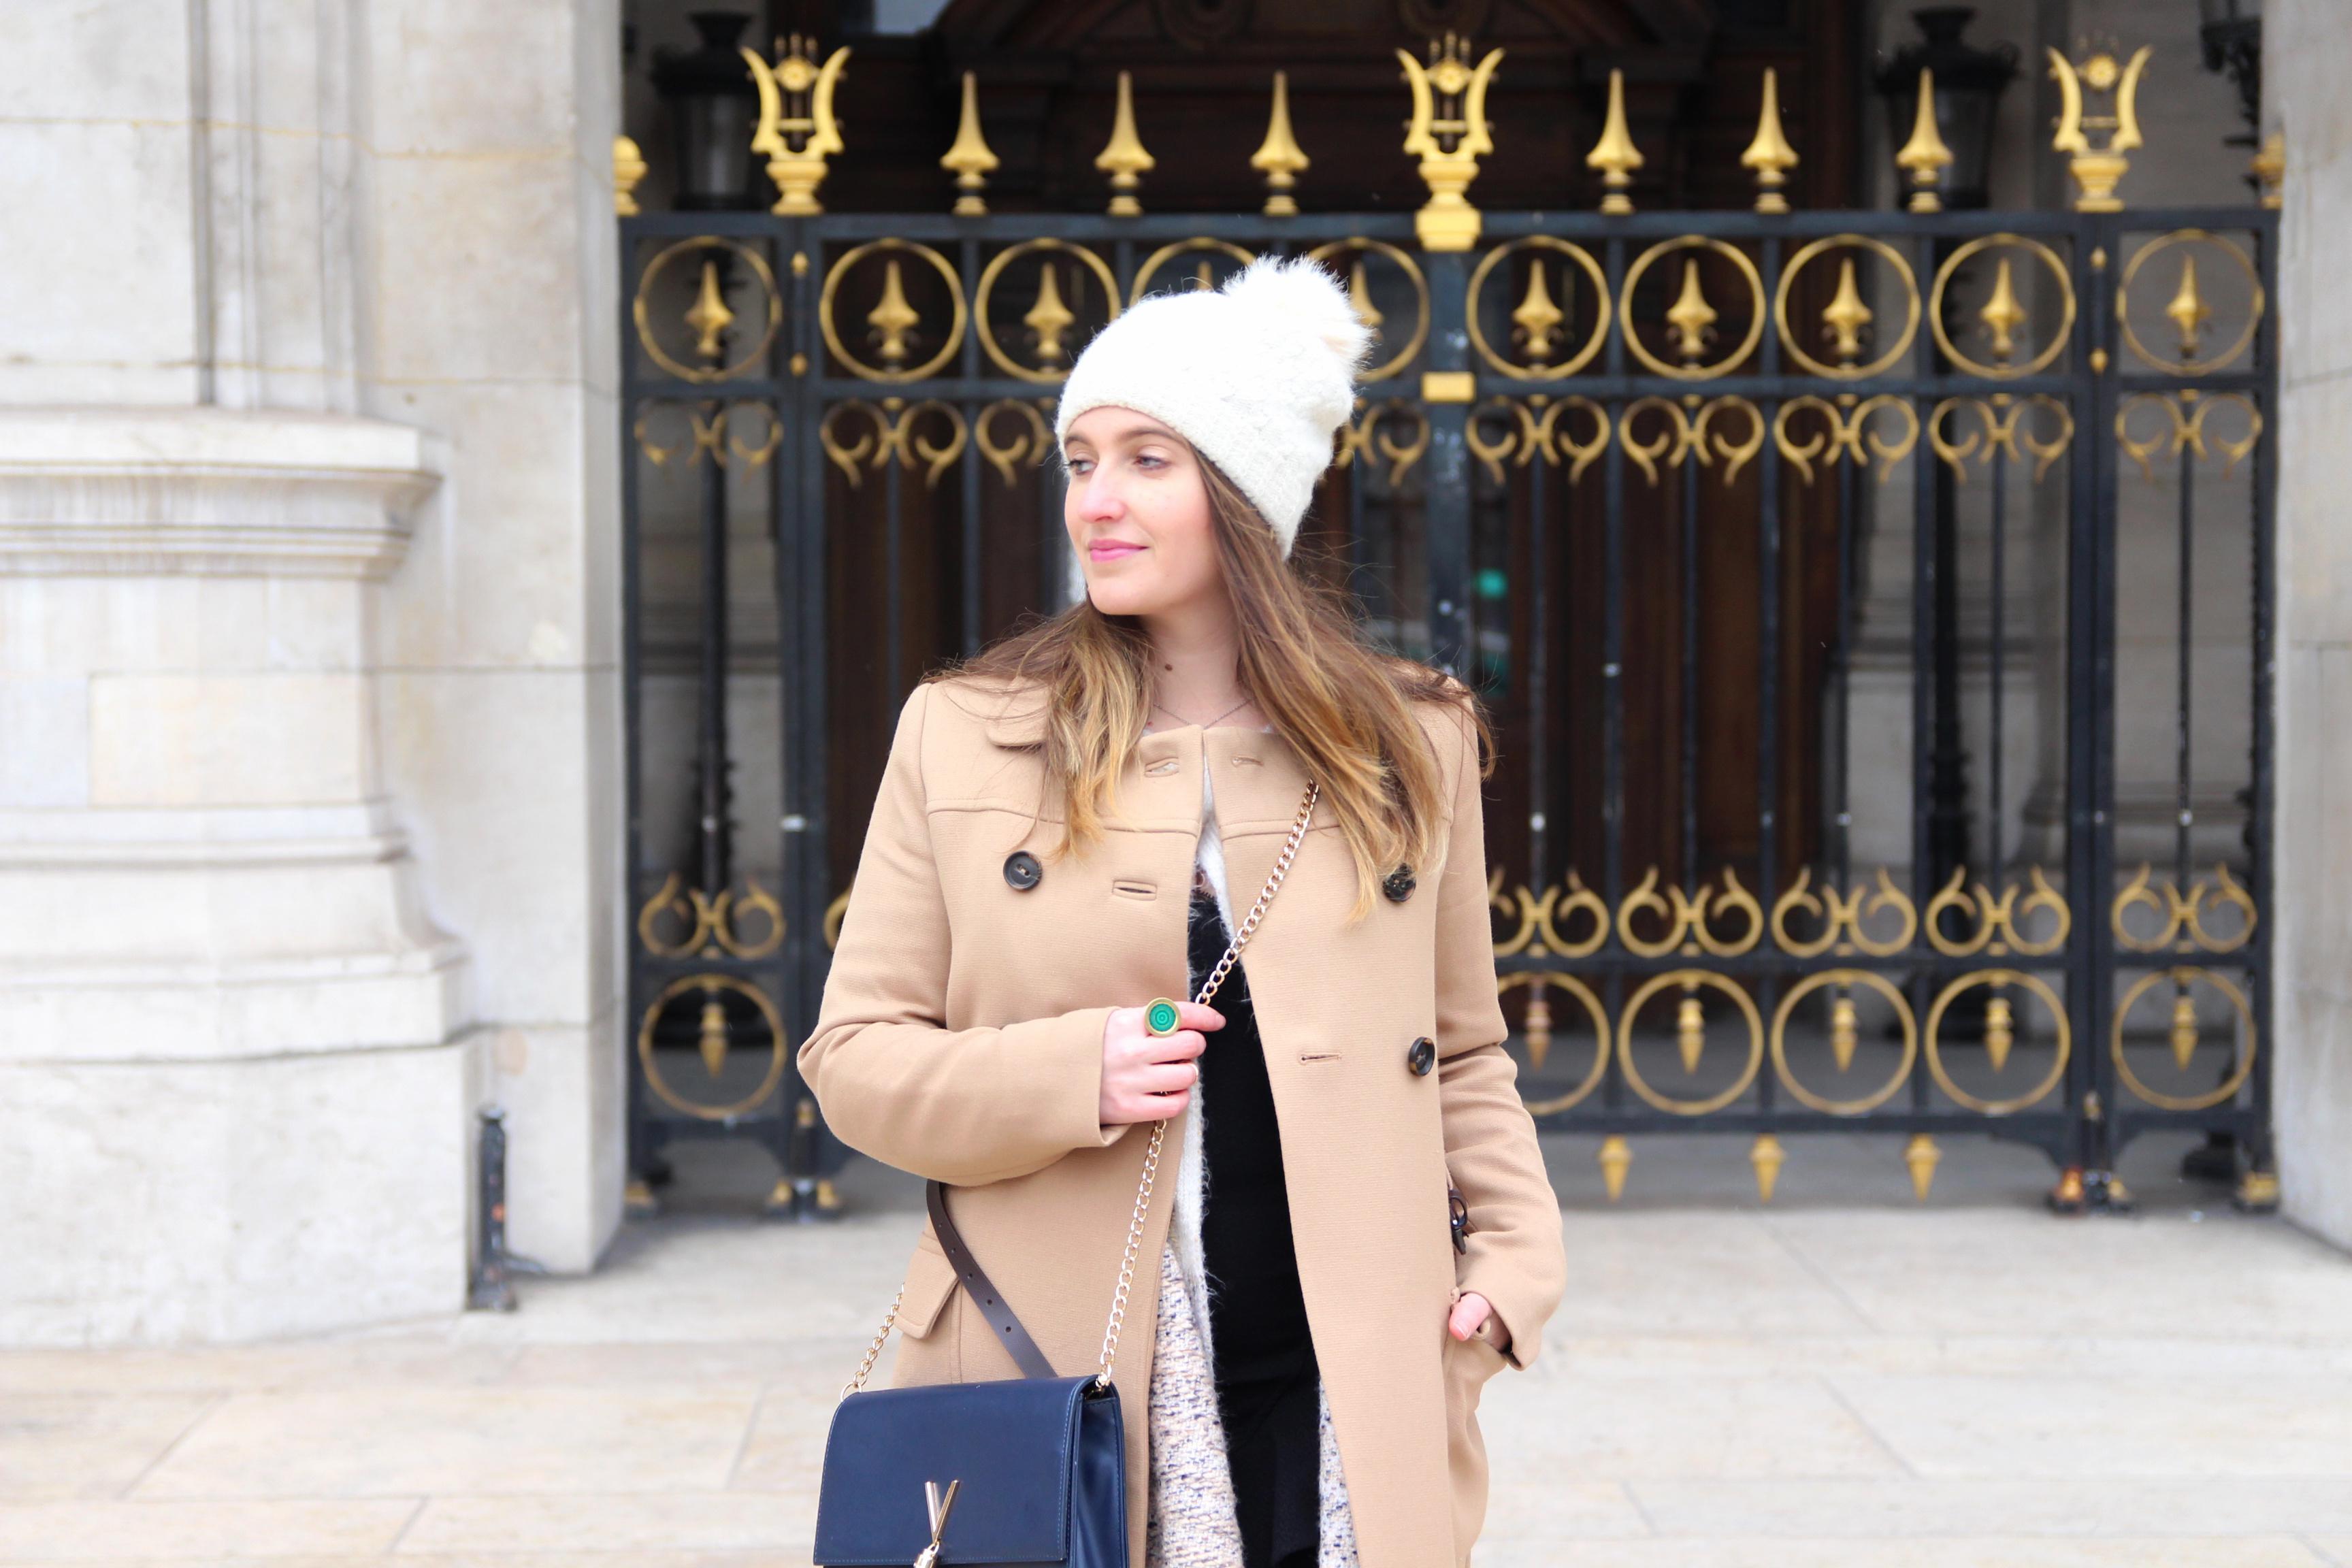 paris-opera-garnier-winter-day-influencer-style-personalstylist-imageconsultant-seralynepointcom-img_6656